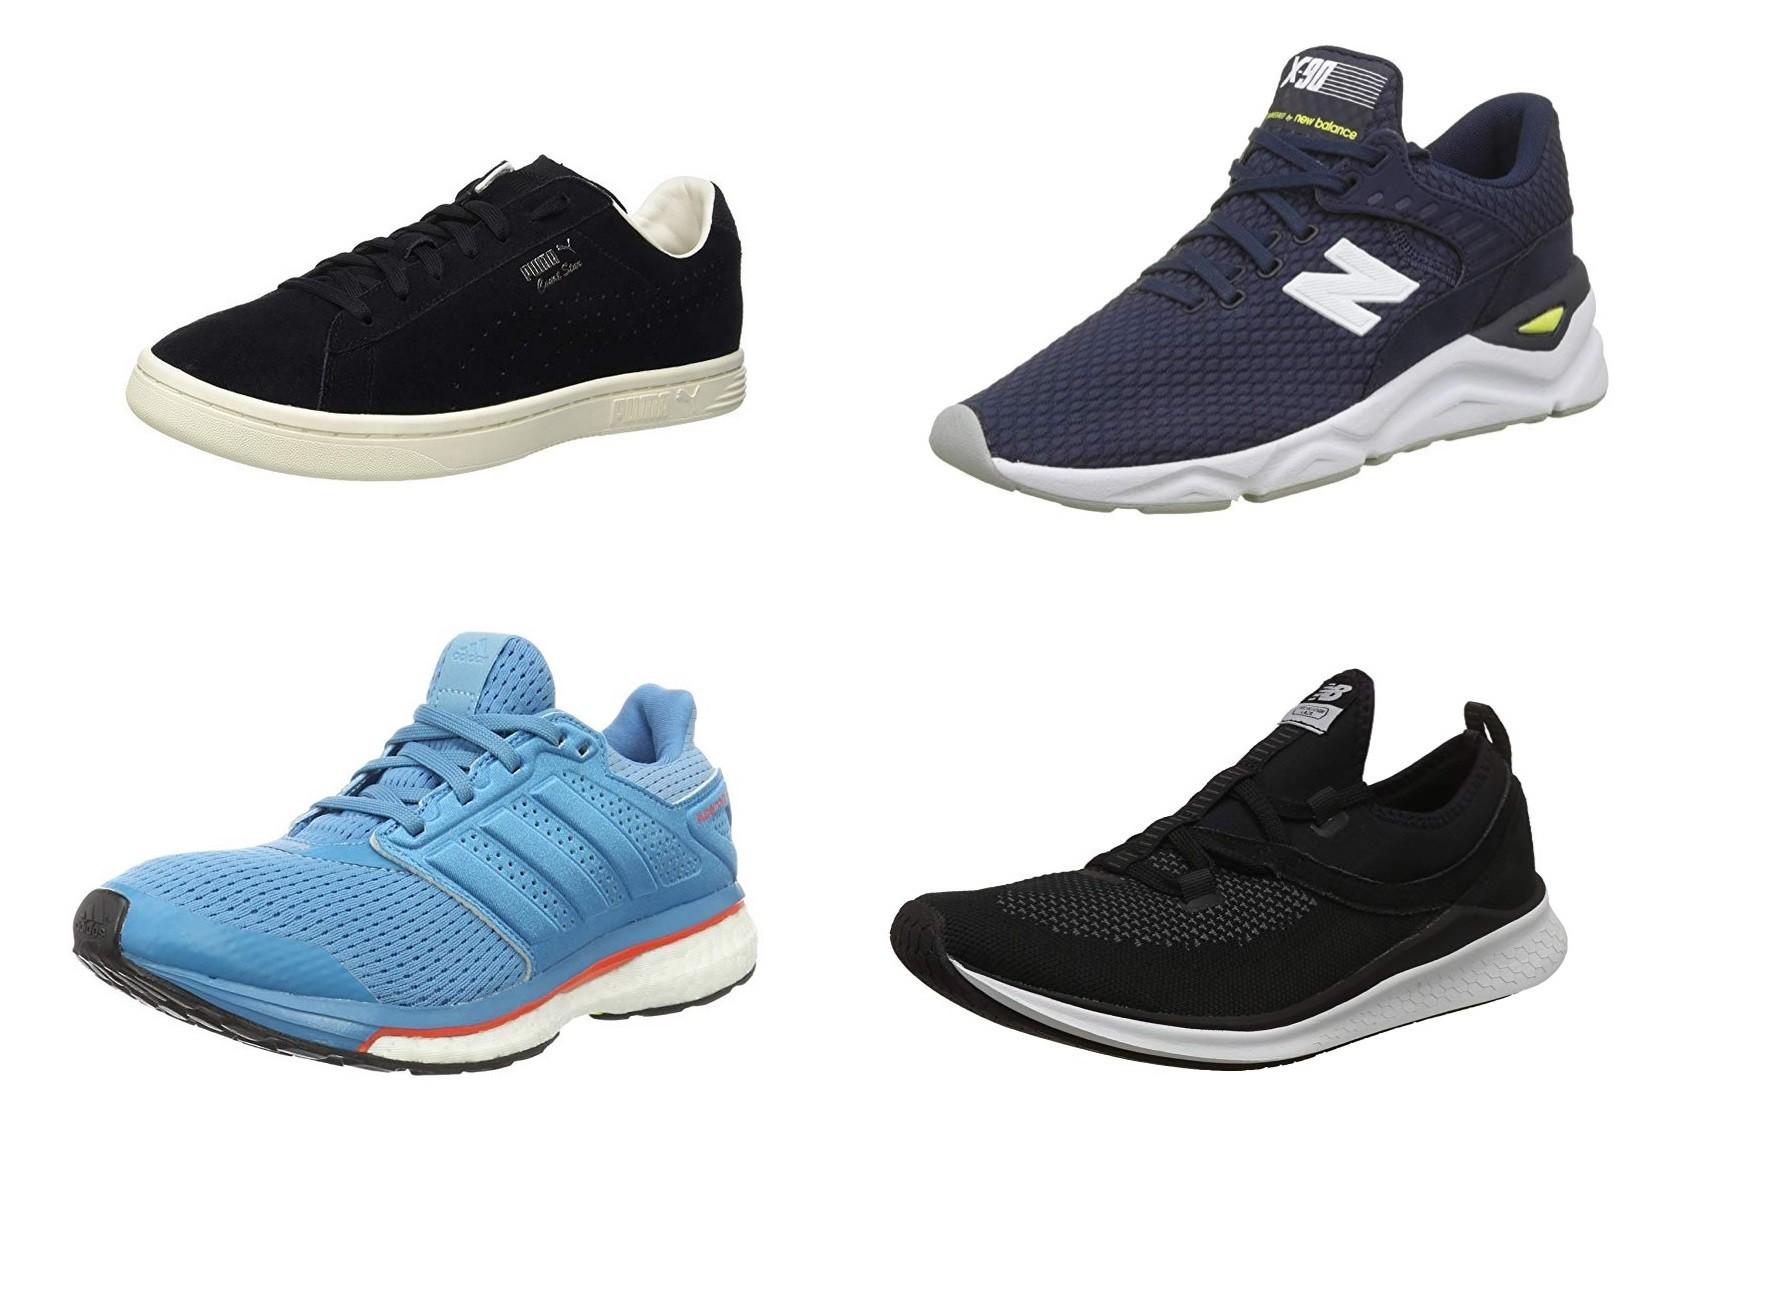 812118442 Chollos en tallas sueltas de zapatillas Puma, New Balance o Adidas en  Amazon por menos de 30 euros